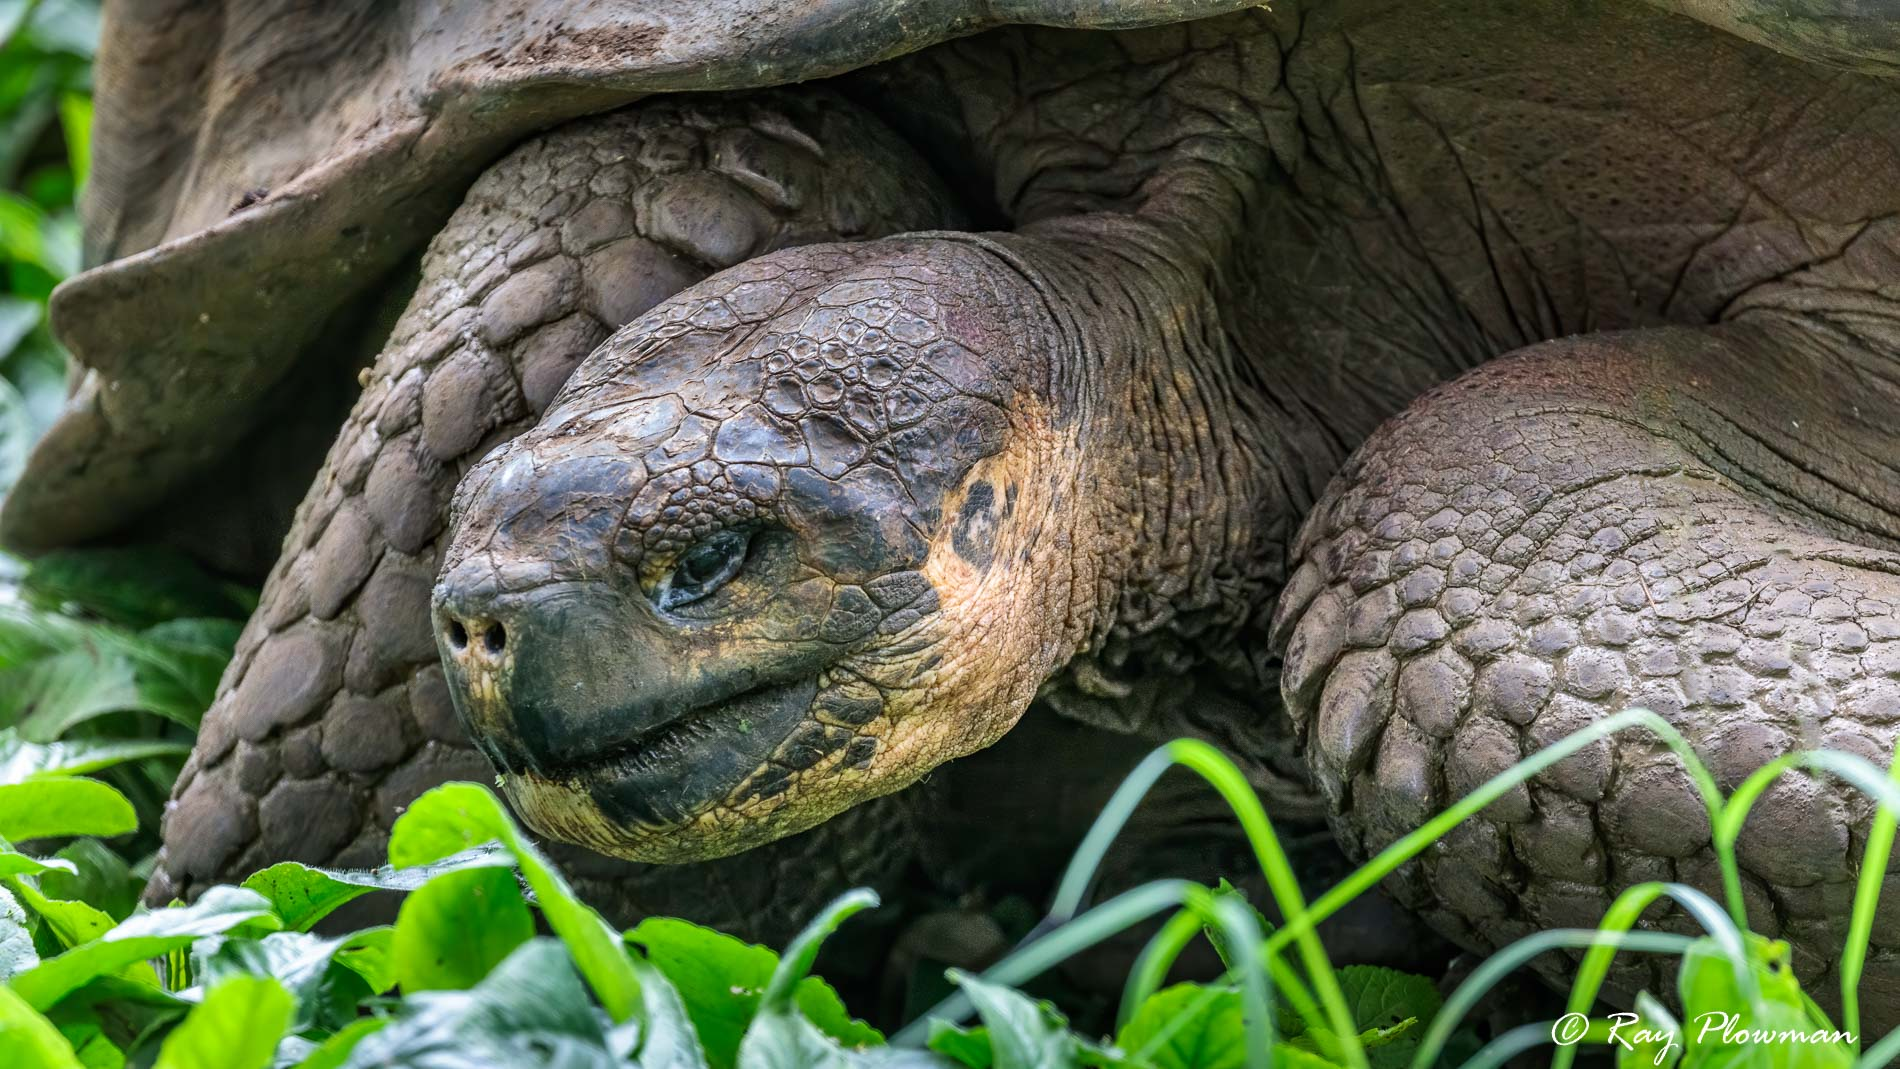 Western Sana Cruz Giant Tortoise (Chelonoidis porteri) at Rancho Manzanillo on Santa Cruz Island in Galapagos